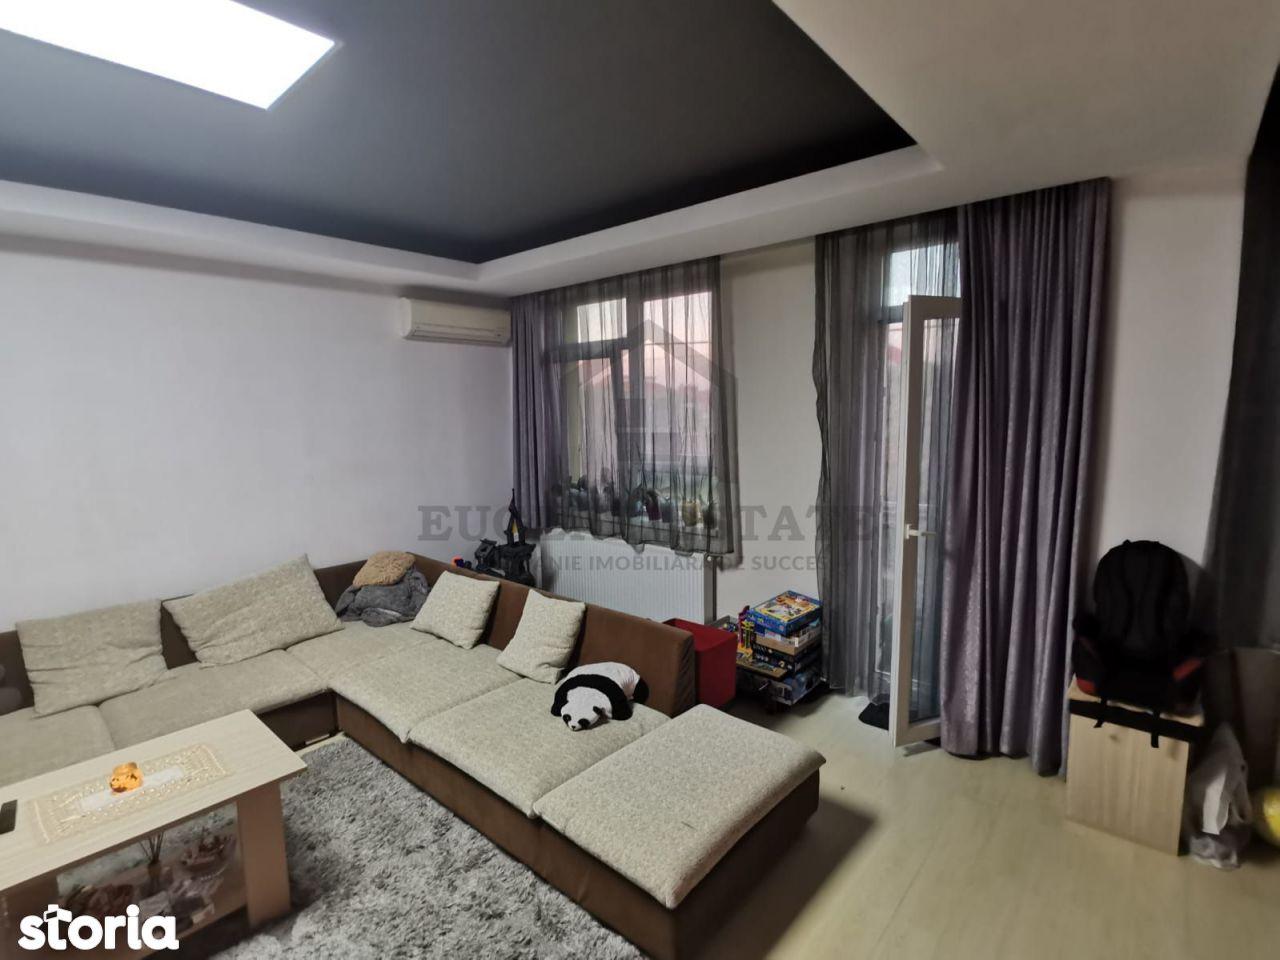 Apartament 3 camere zona Steaua